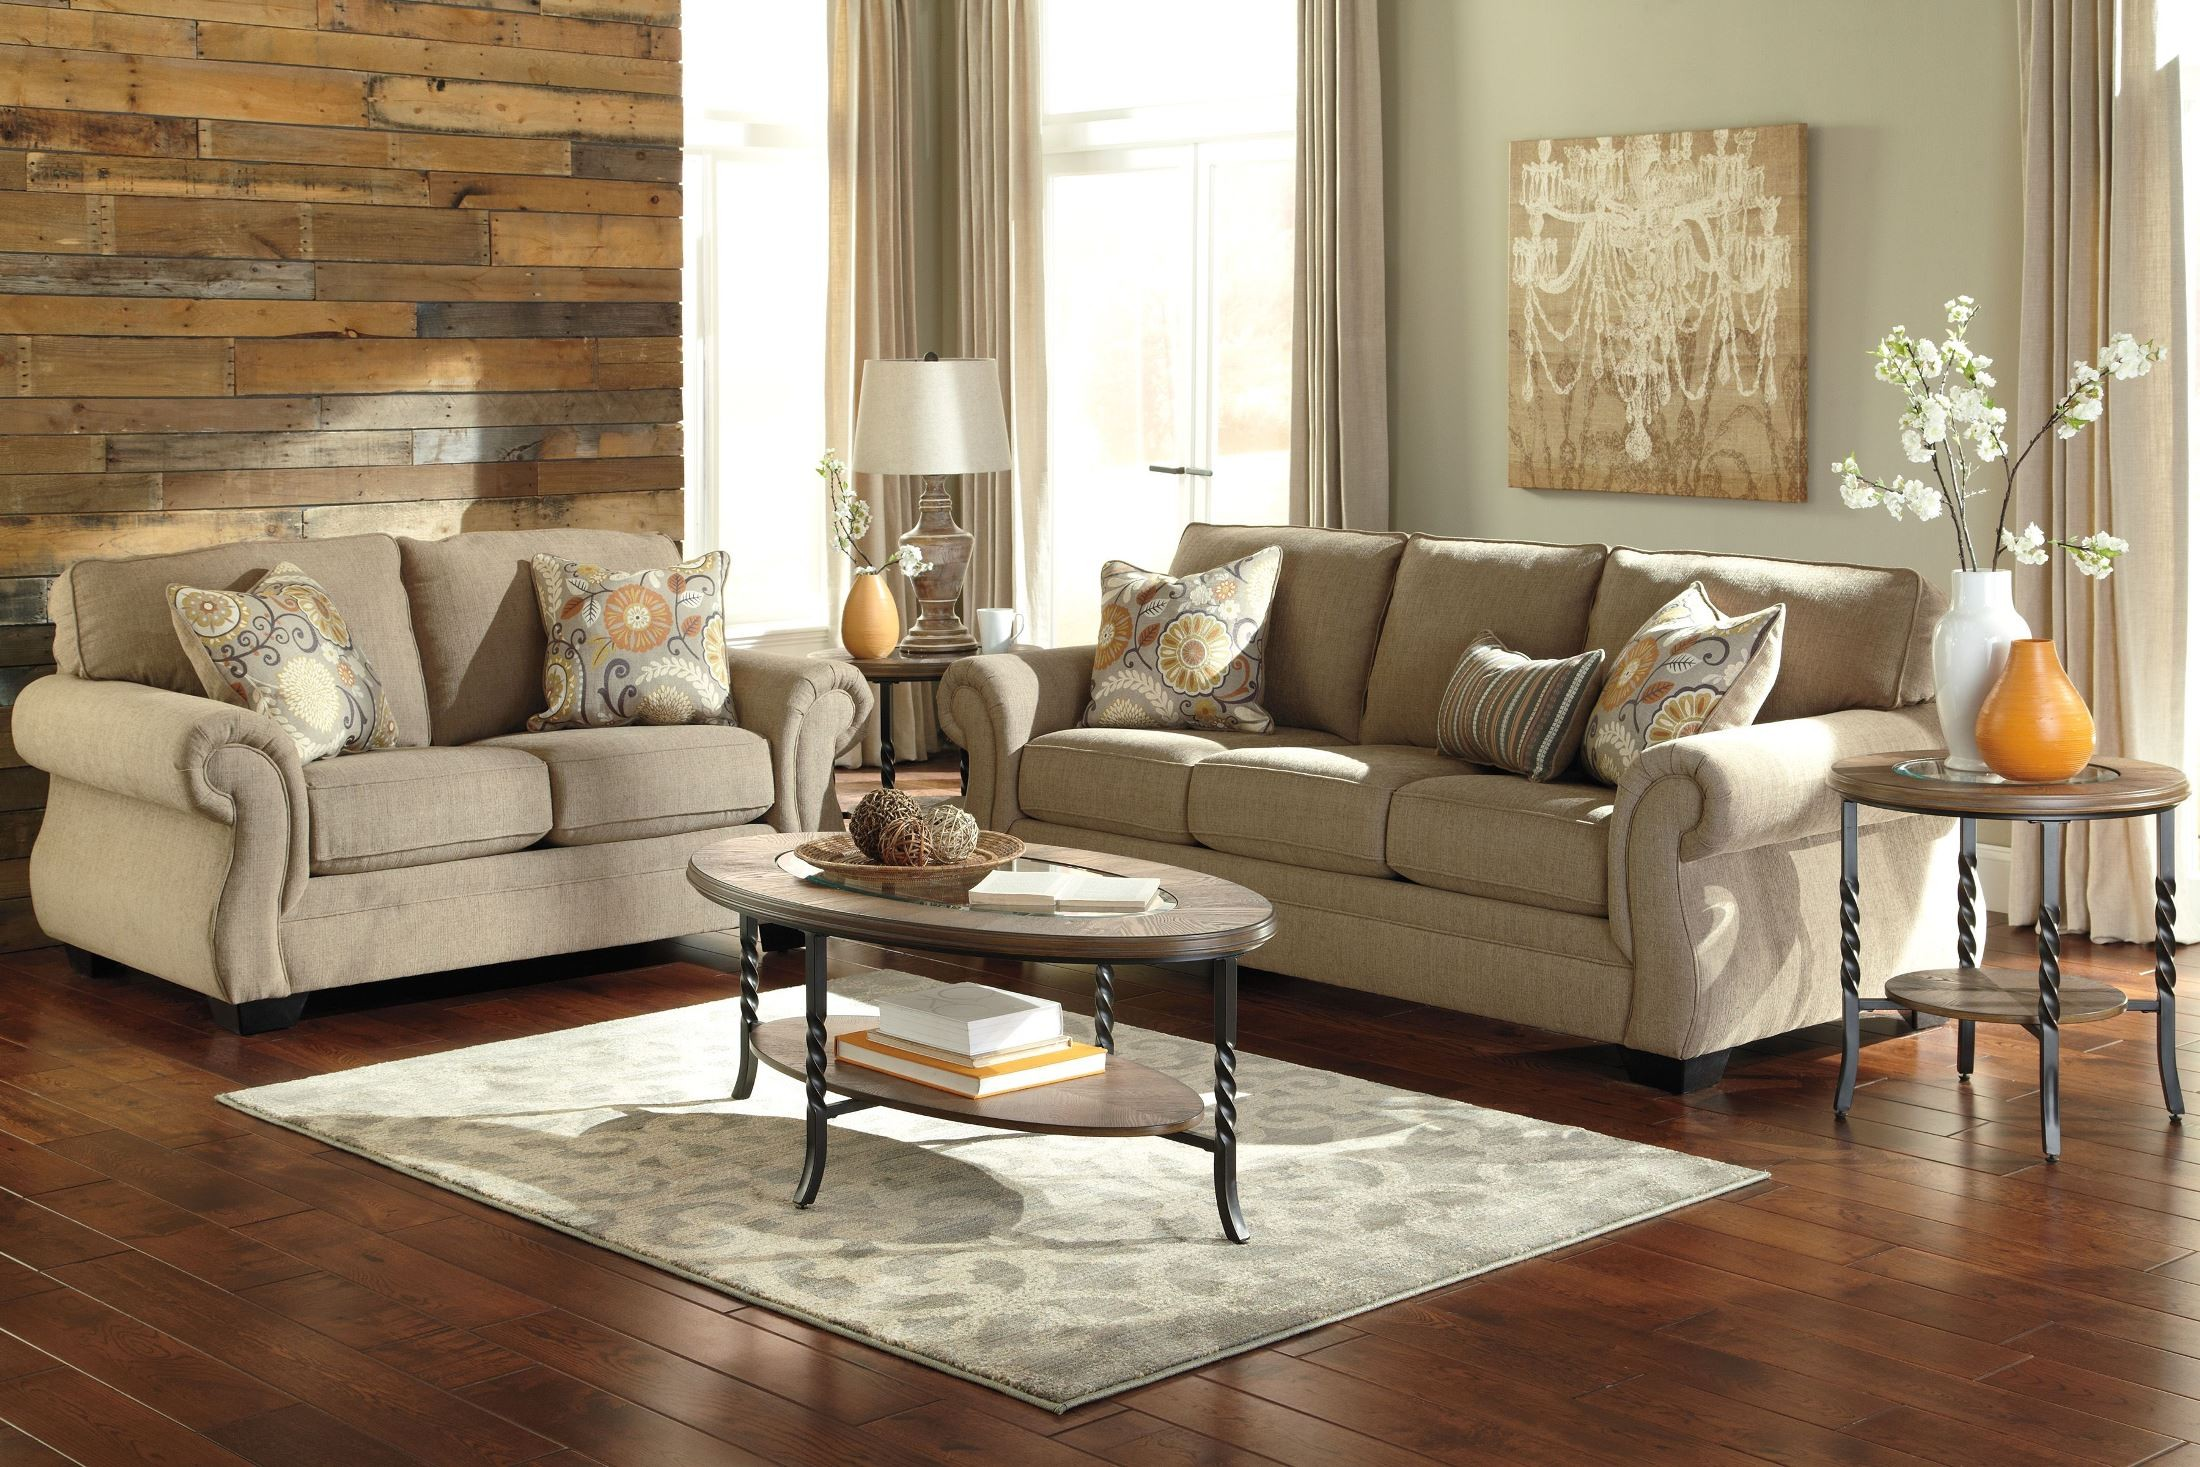 Tailya Barley Living Room Set from Ashley